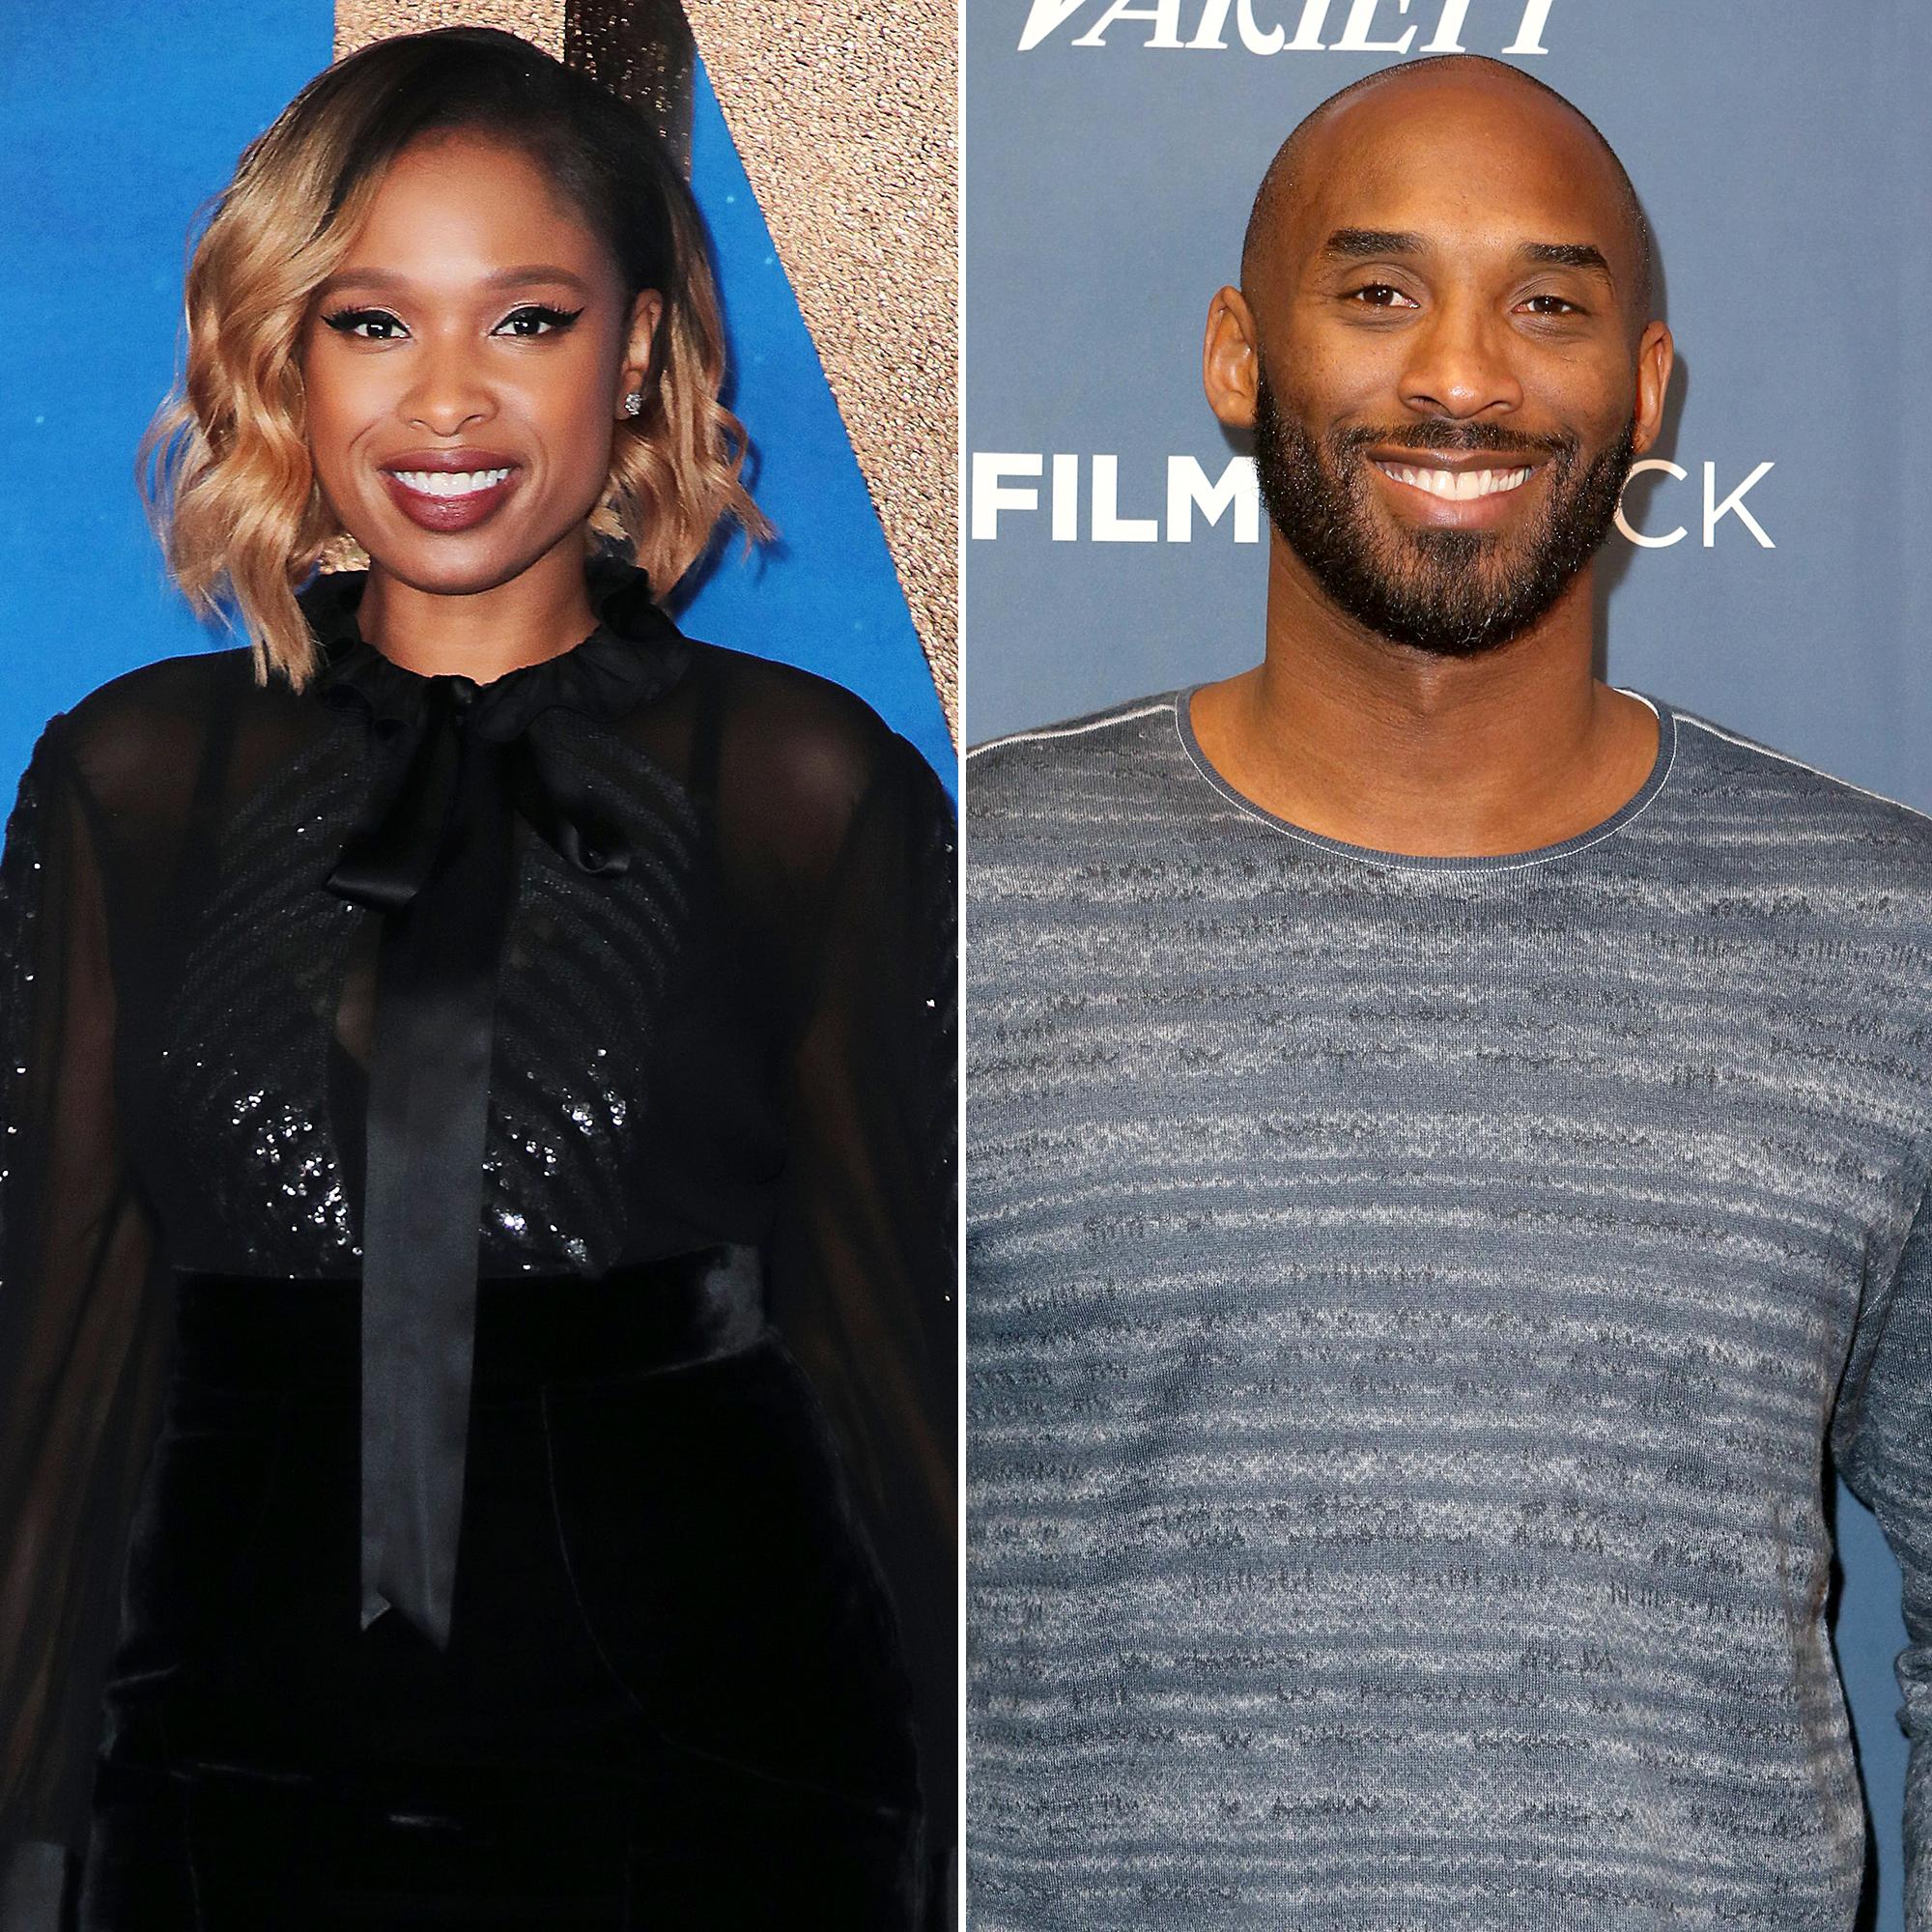 Jennifer-Hudson-to-Perform-Kobe-Bryant-Tribute-at-NBA-All-Star-Game-2020